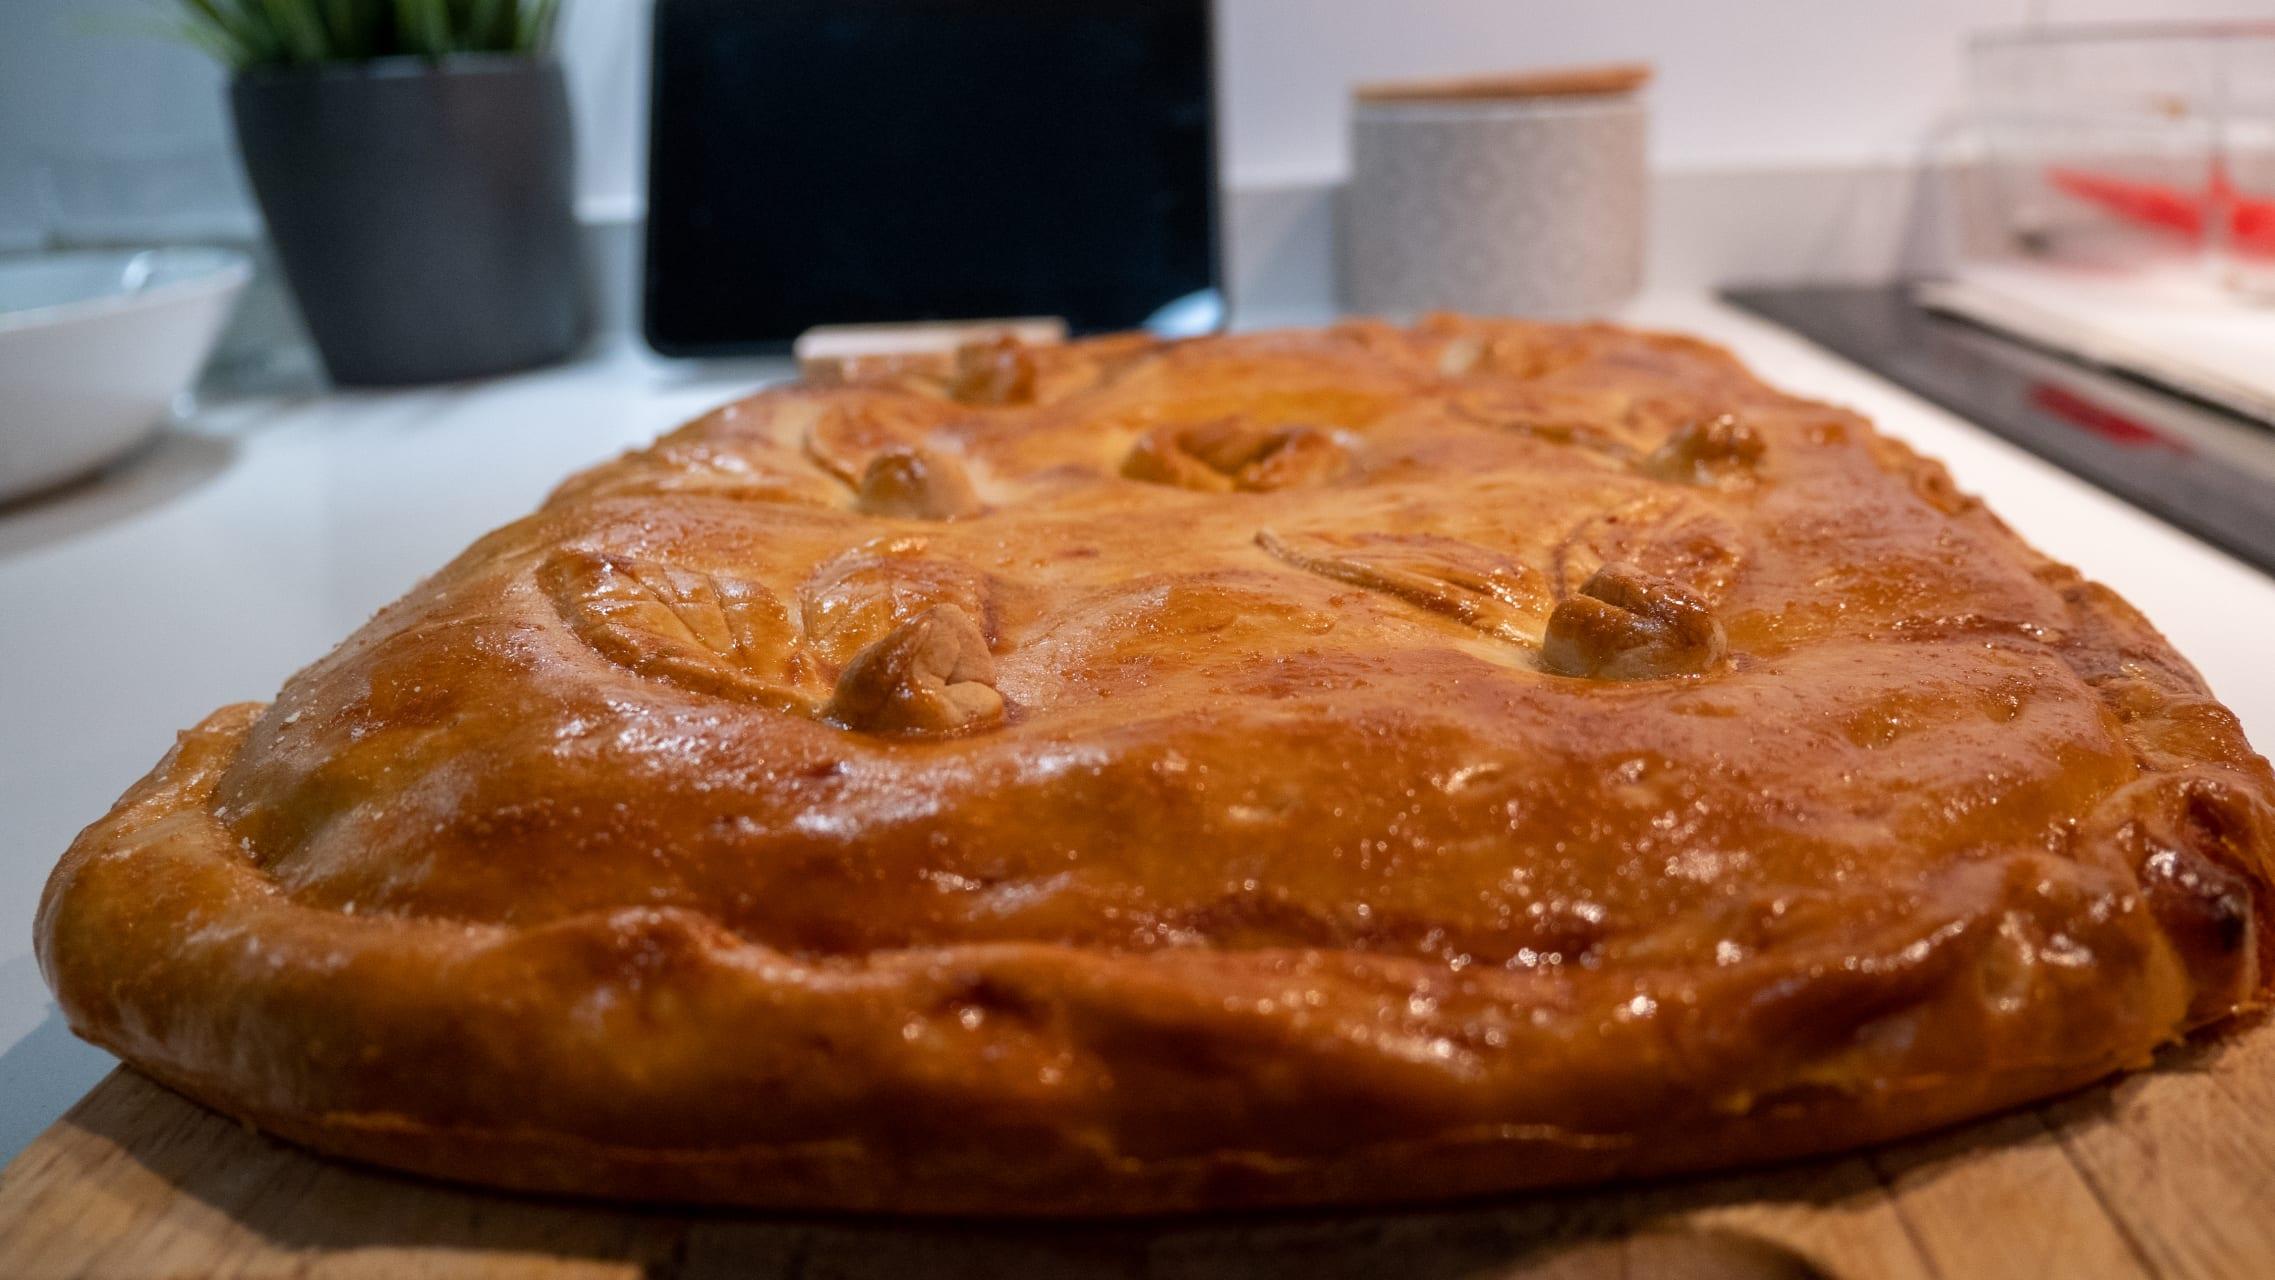 Galicia - Cooking Demo: Galician Empanada Pie with Xoubas (Small Sardines)